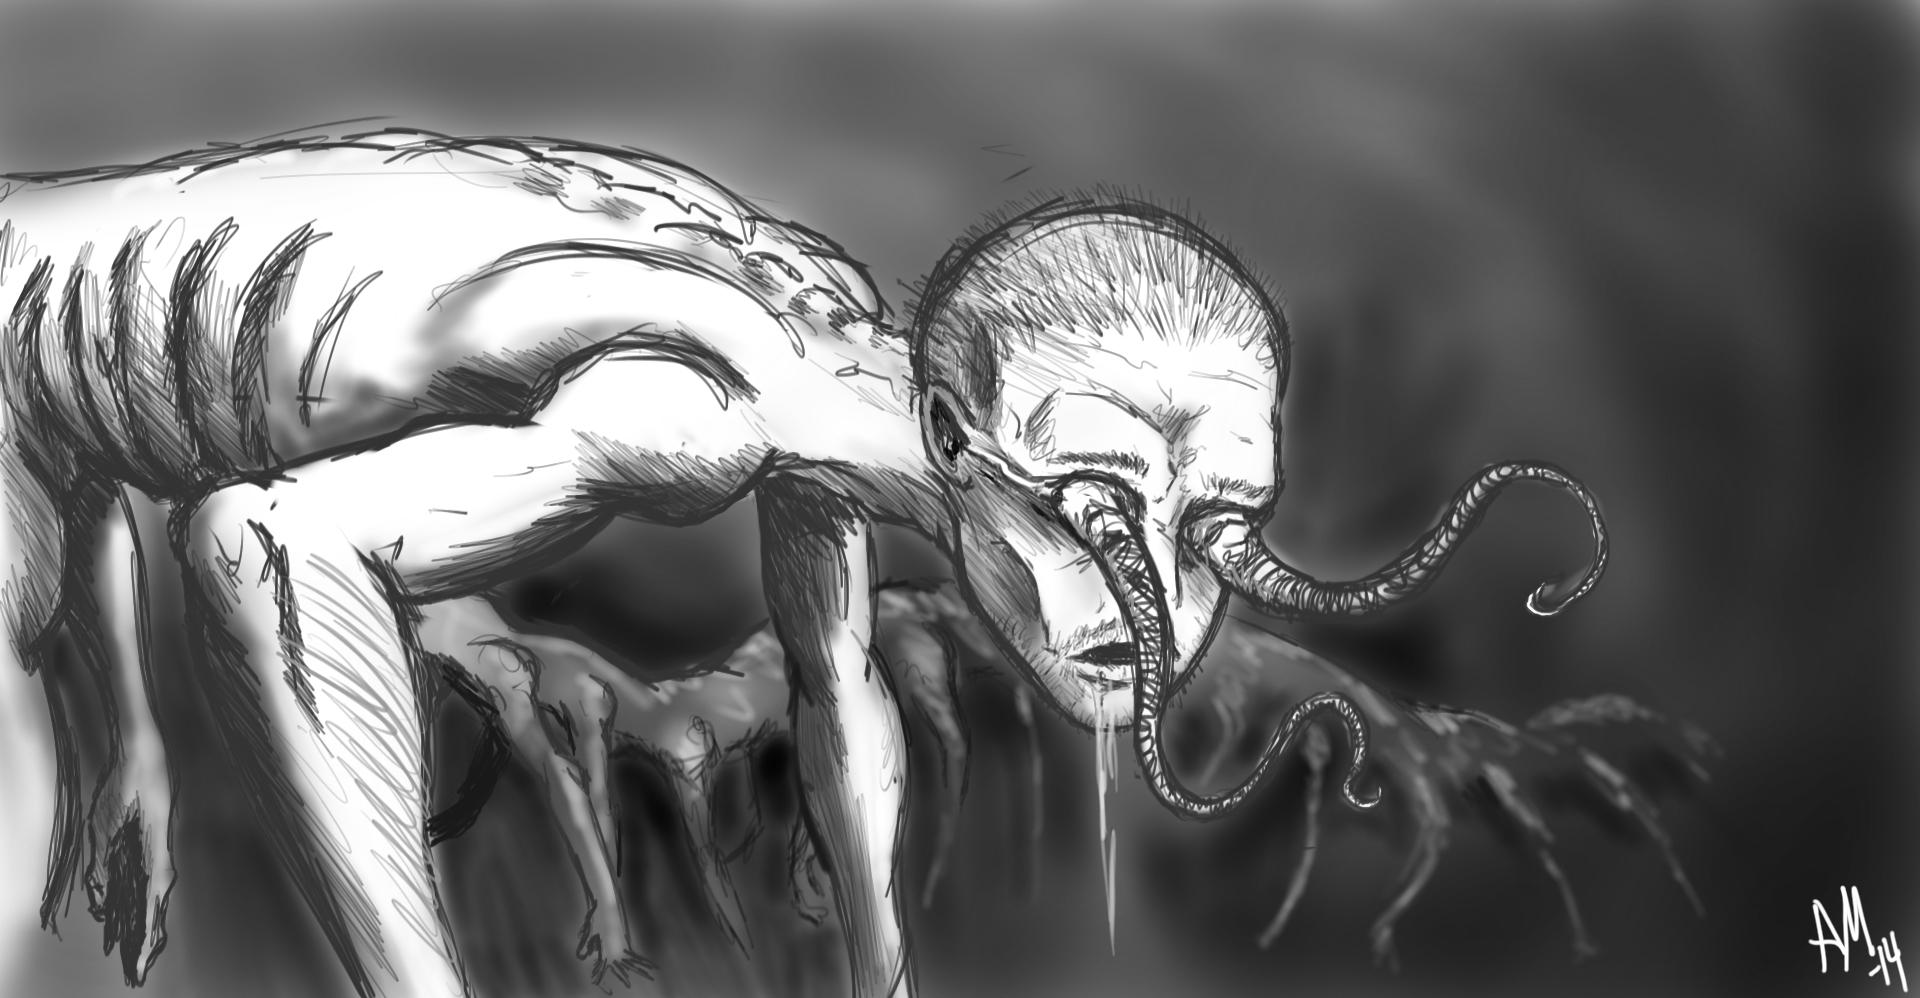 Centipede Man